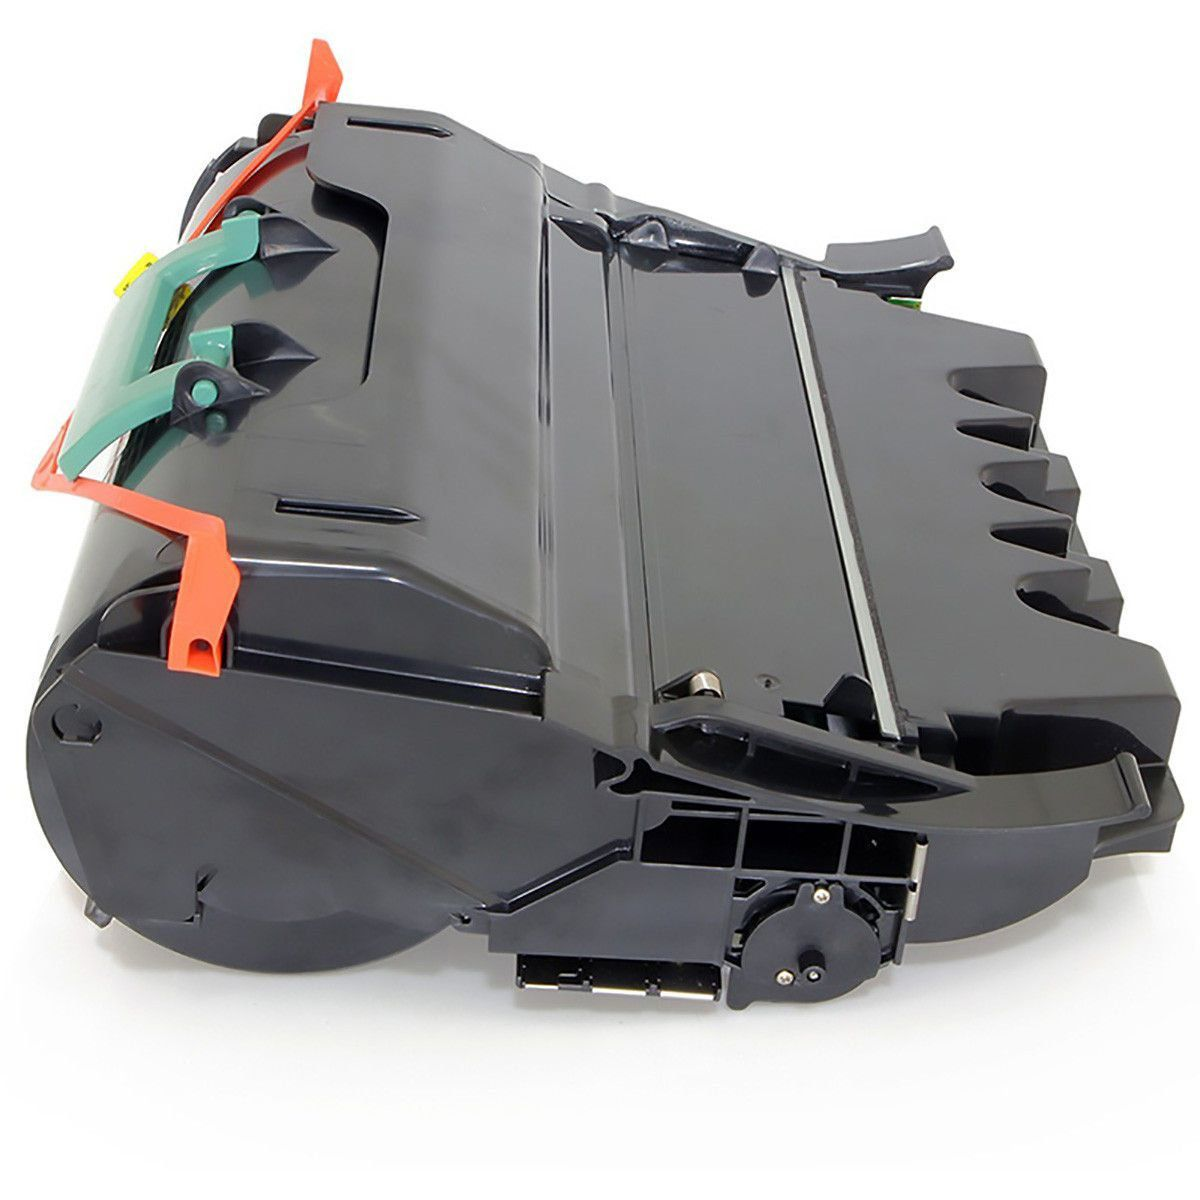 Compatível: Toner T654X11B para Lexmark T650 T650n T652 T652dn T654 T654dn T654dtn T656 X656 X658 / Preto / 25.000